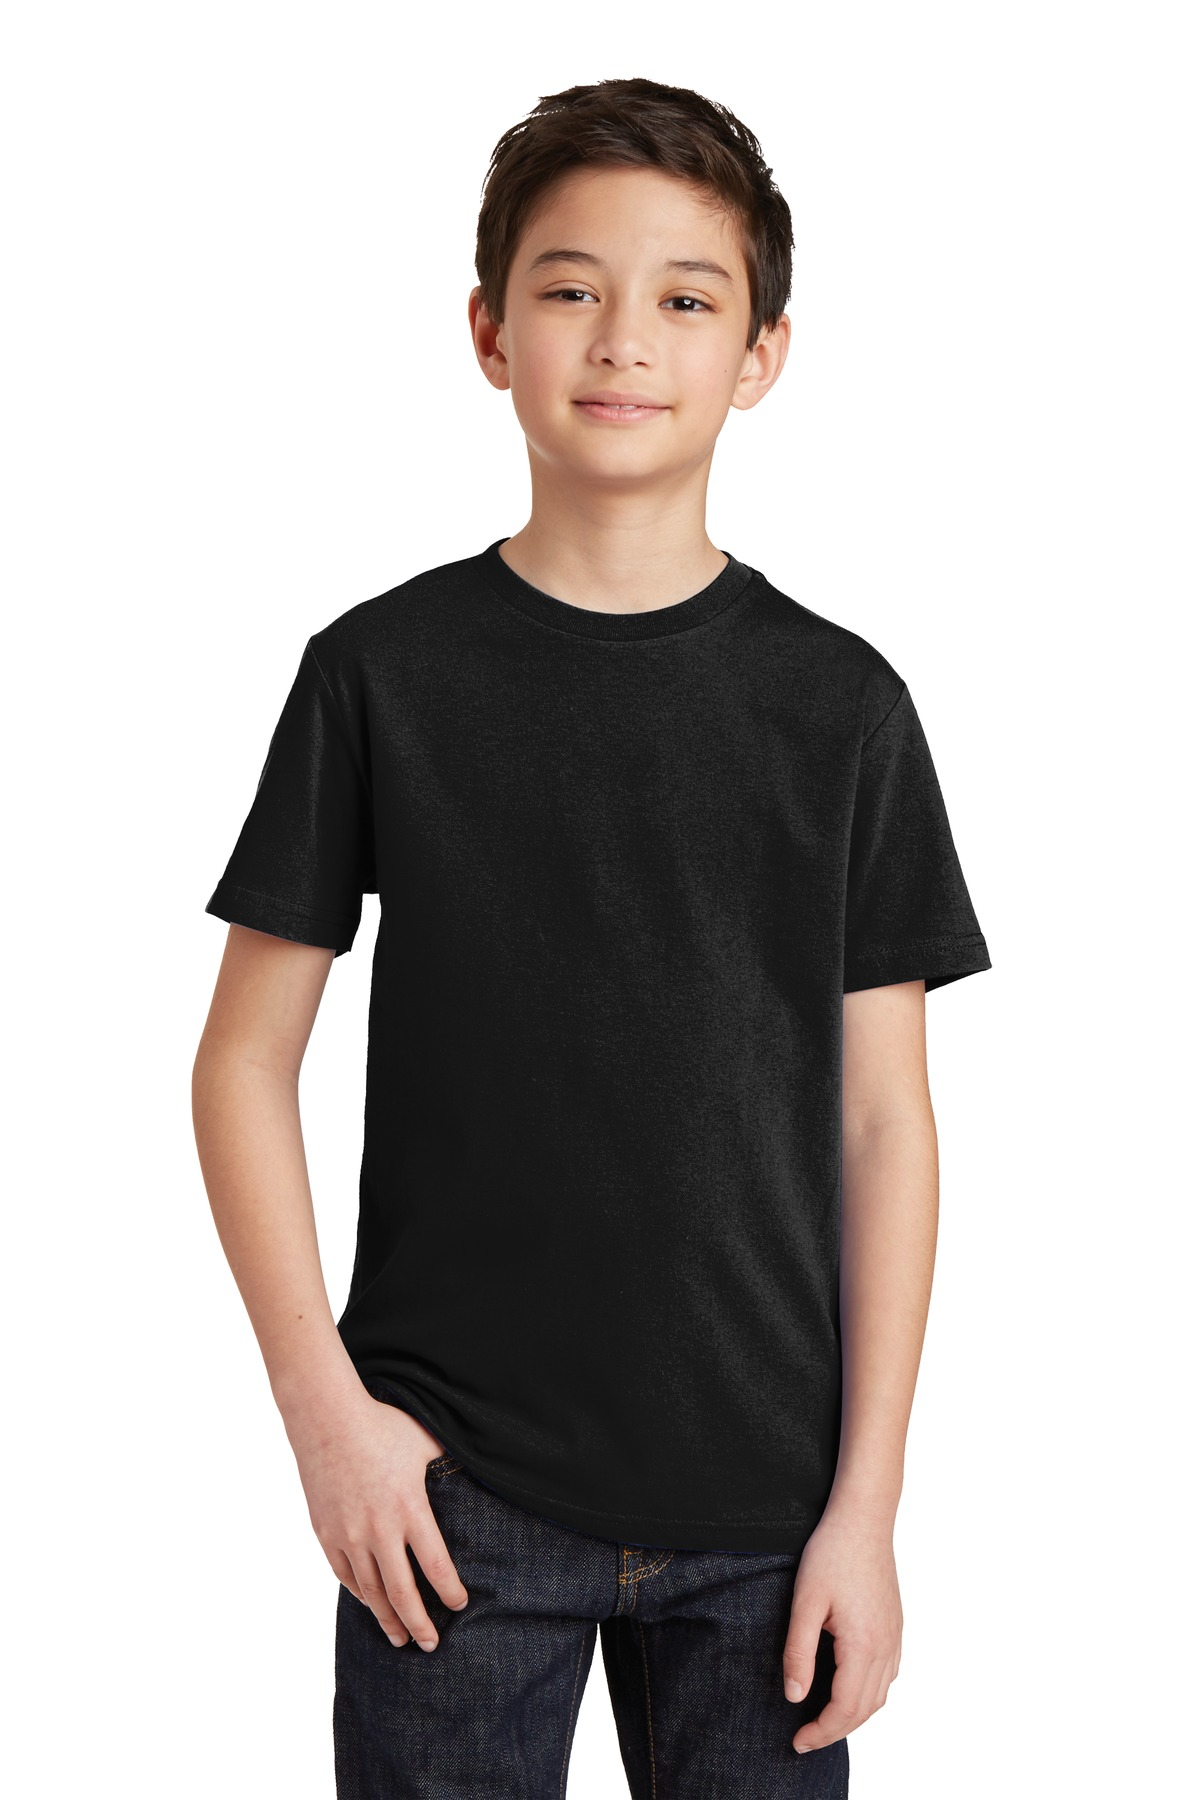 Mens Black Shirts